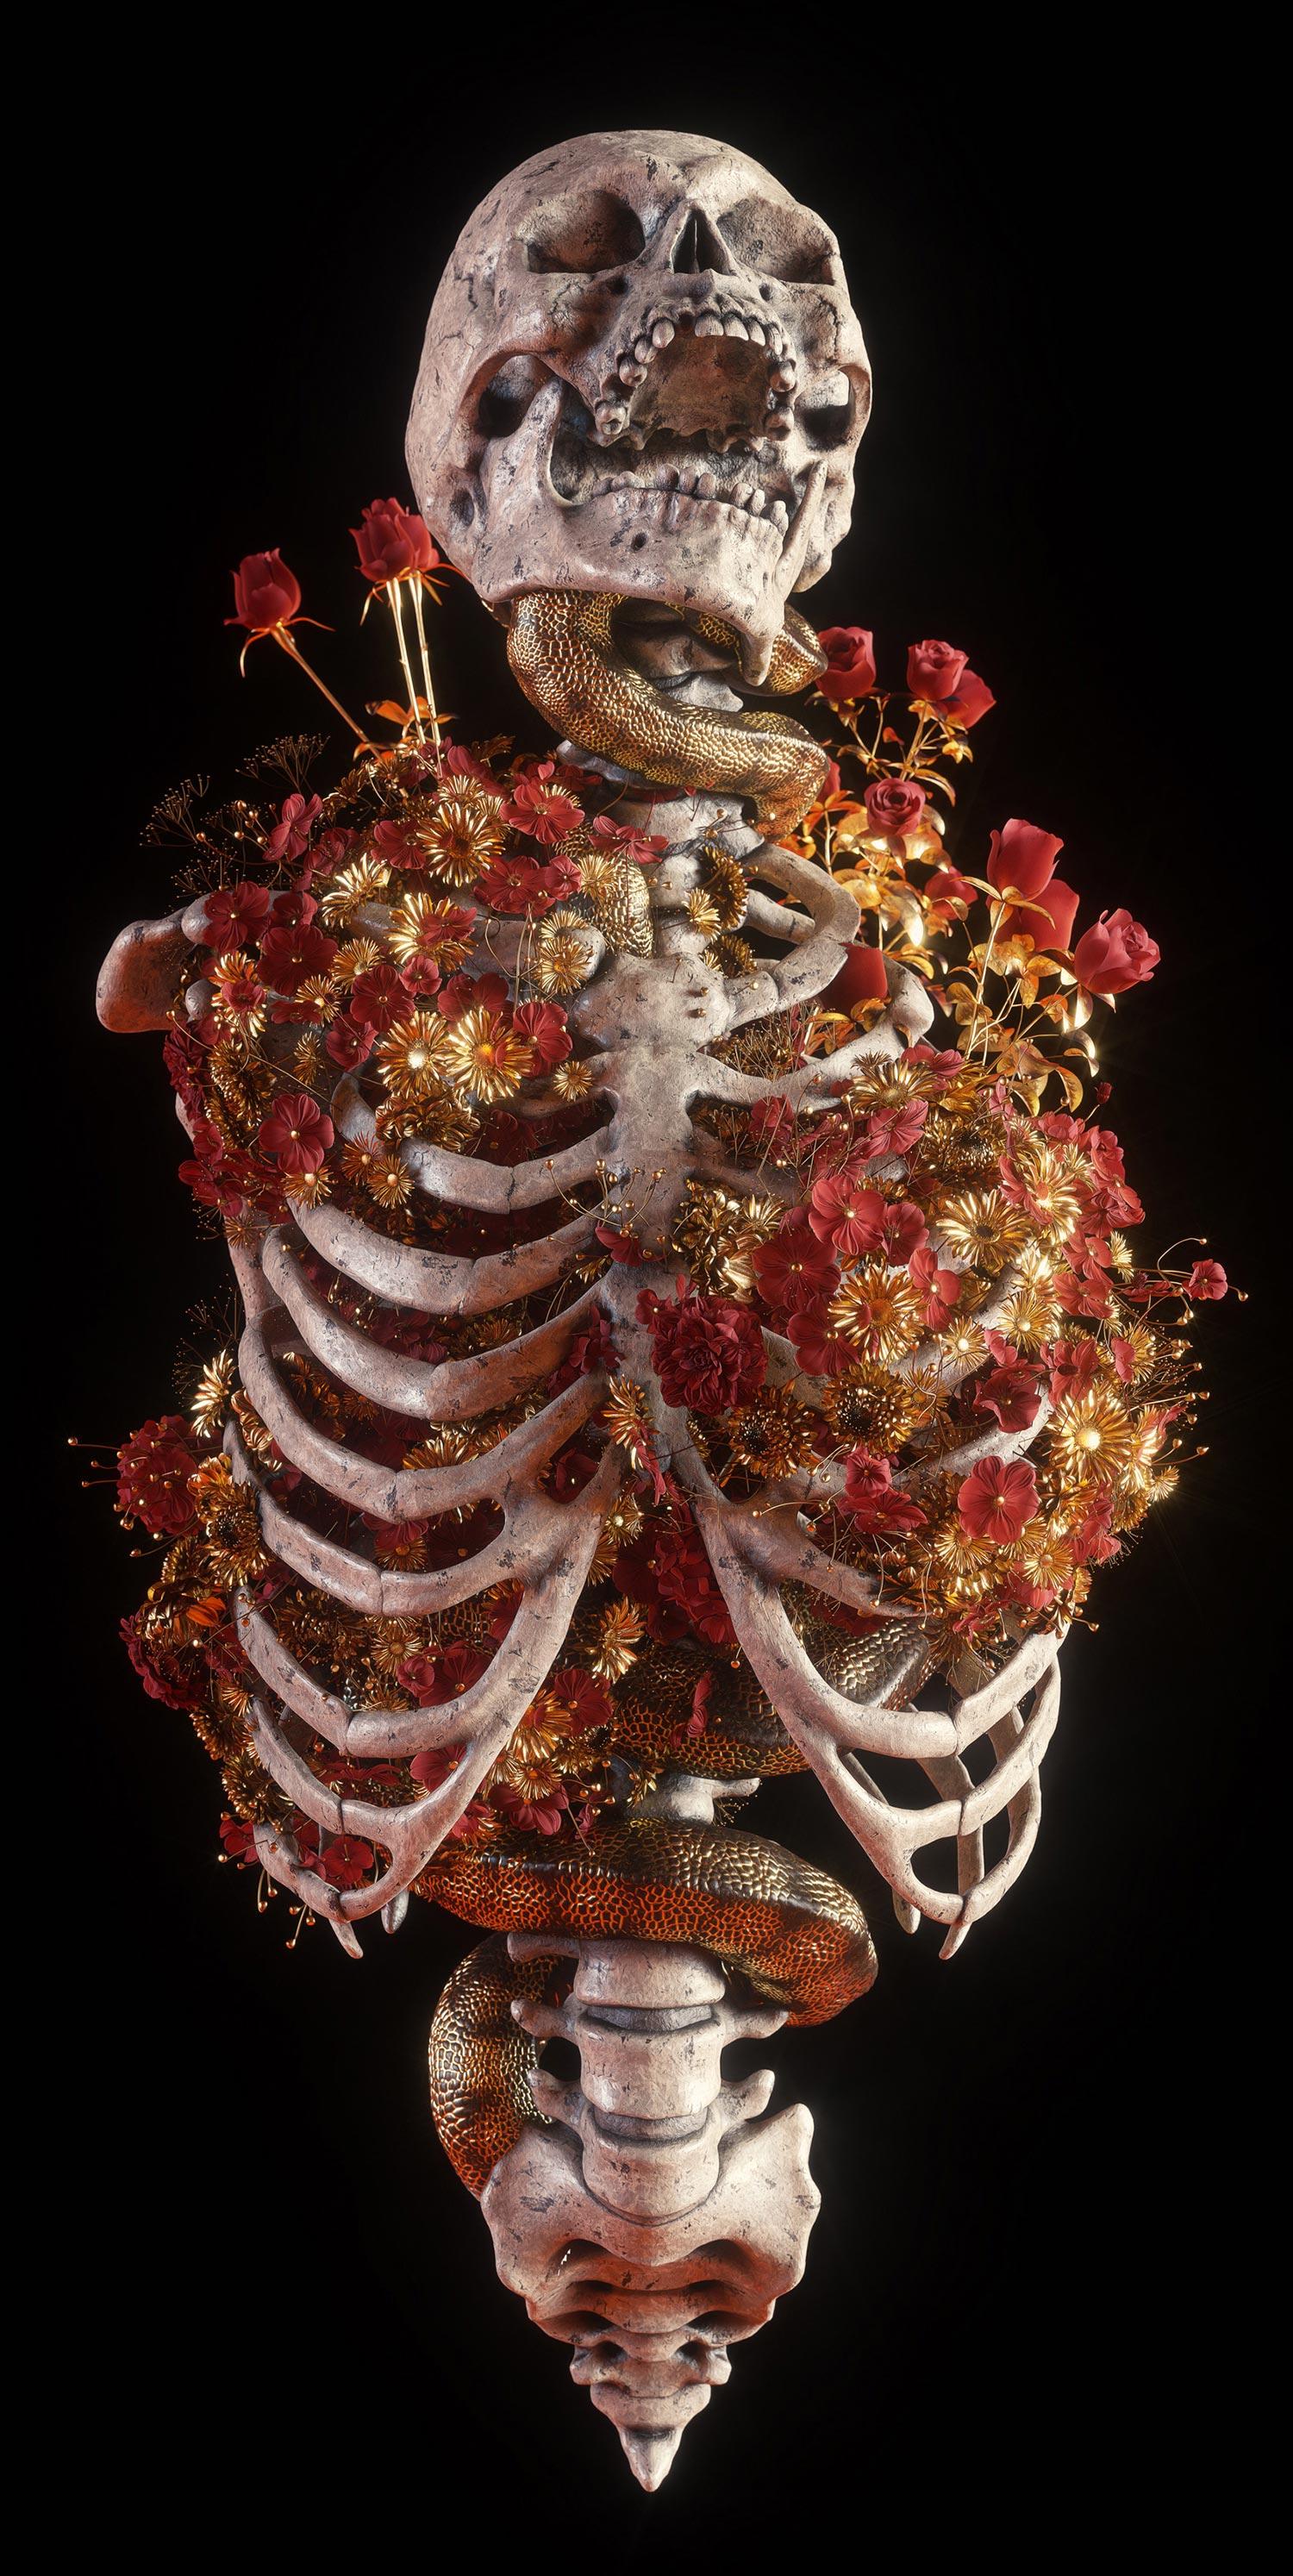 Billelis - Blossom ribcage